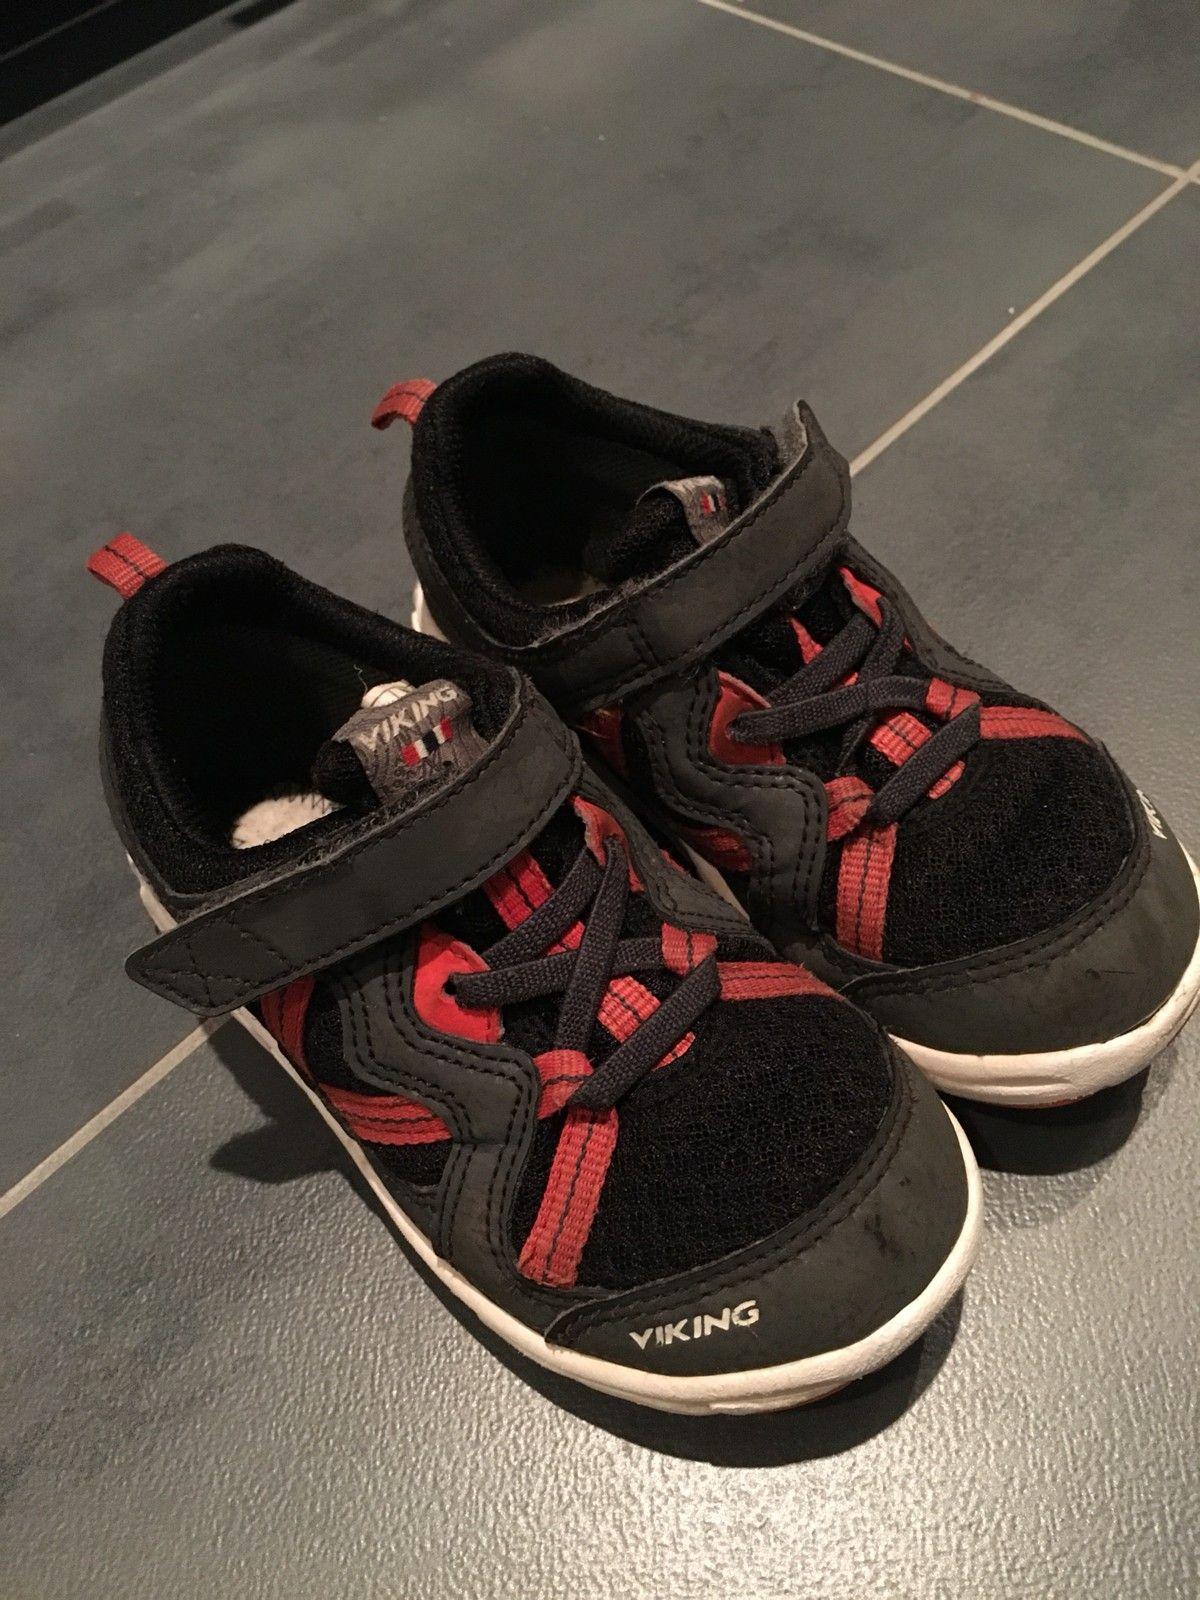 94657feb49c0 Viking sko joggesko barn 29 Goretex